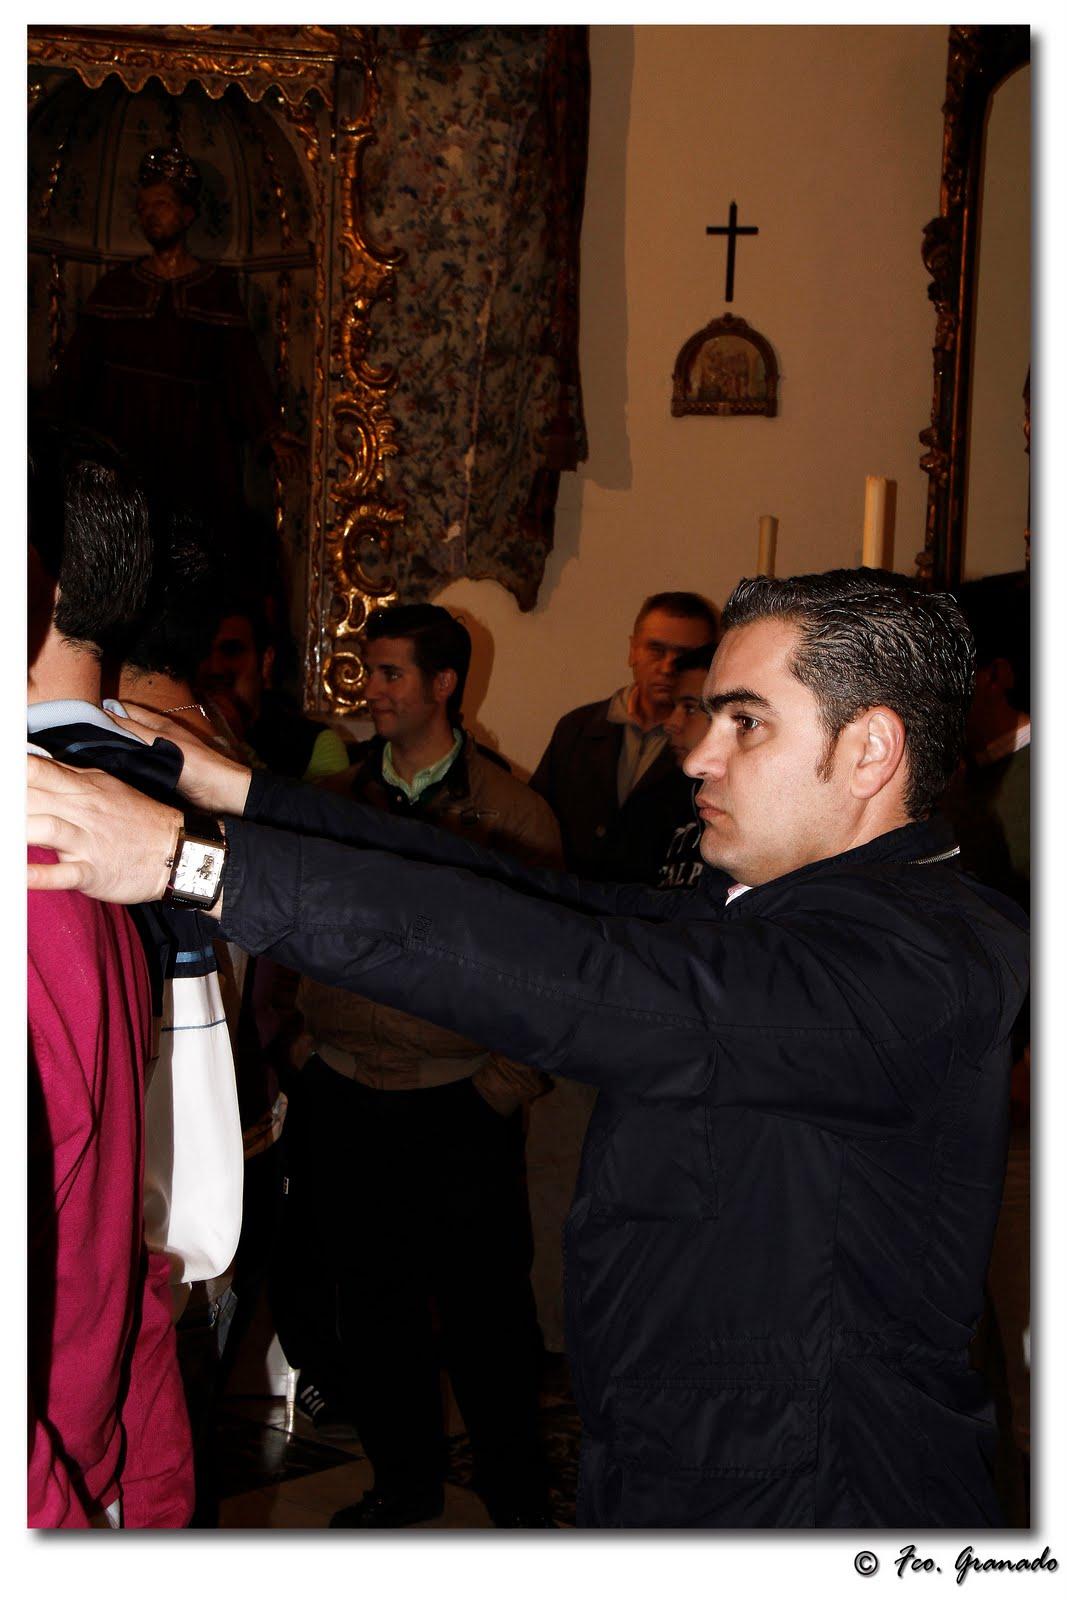 http://franciscogranadopatero35.blogspot.com.es/2011/02/iguala-de-la-cuadrilla-de-costaleros-de.html